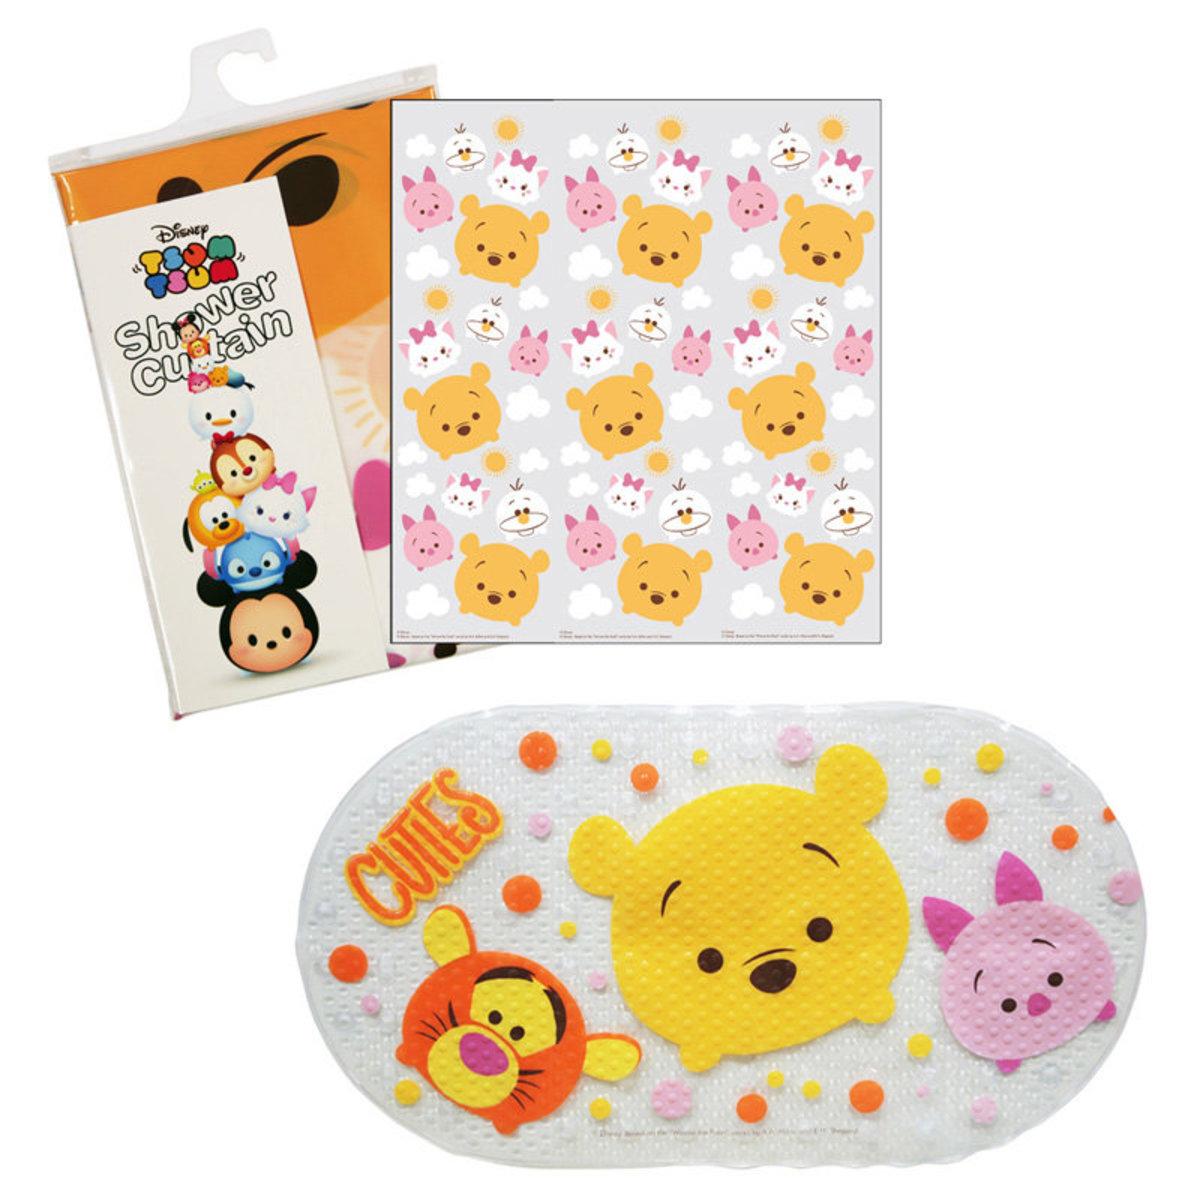 Shower Curtain & Bath Mat Set (Pooh & Marie) (Licensed by Disney)